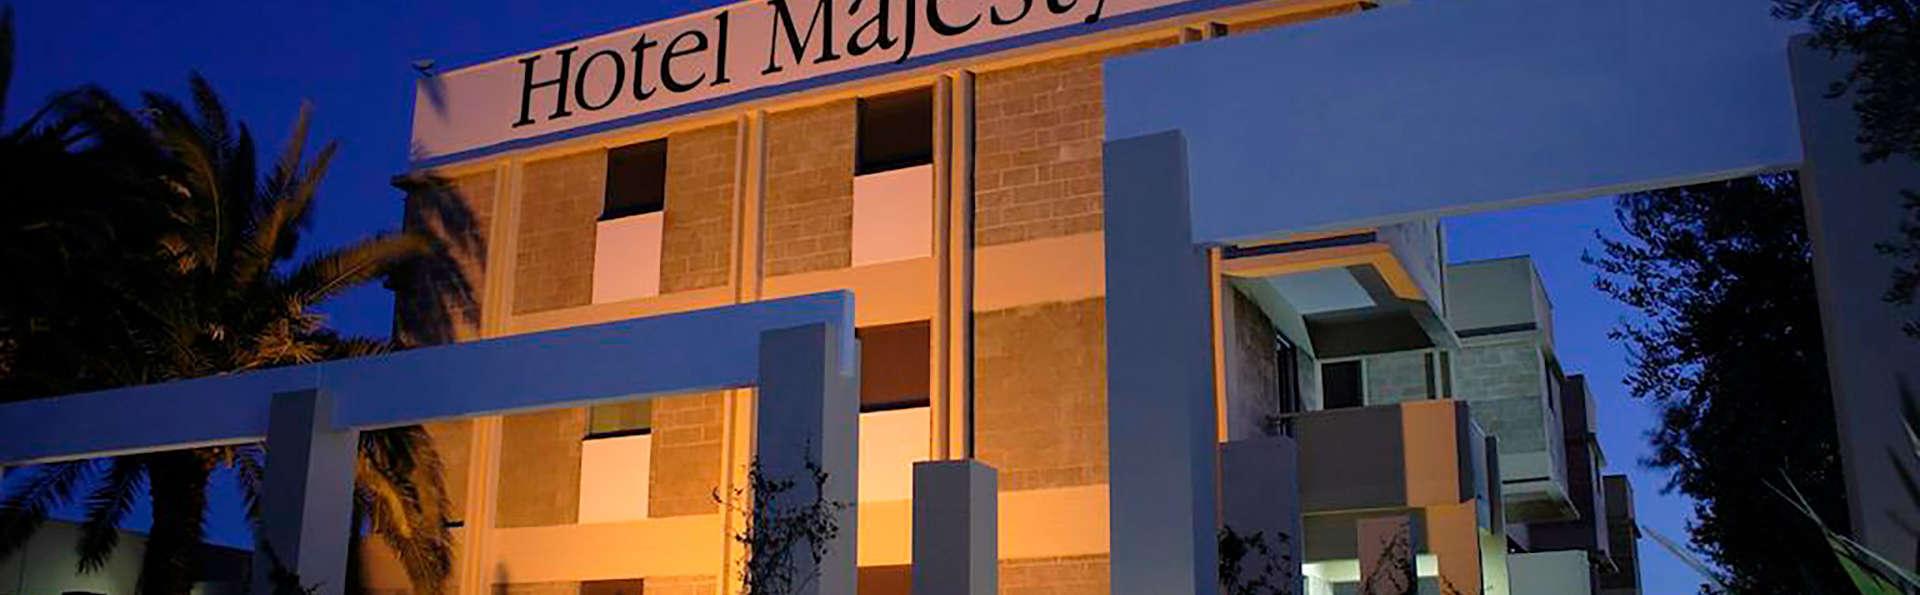 Hotel Majesty - EDIT_N_FRONT.jpg